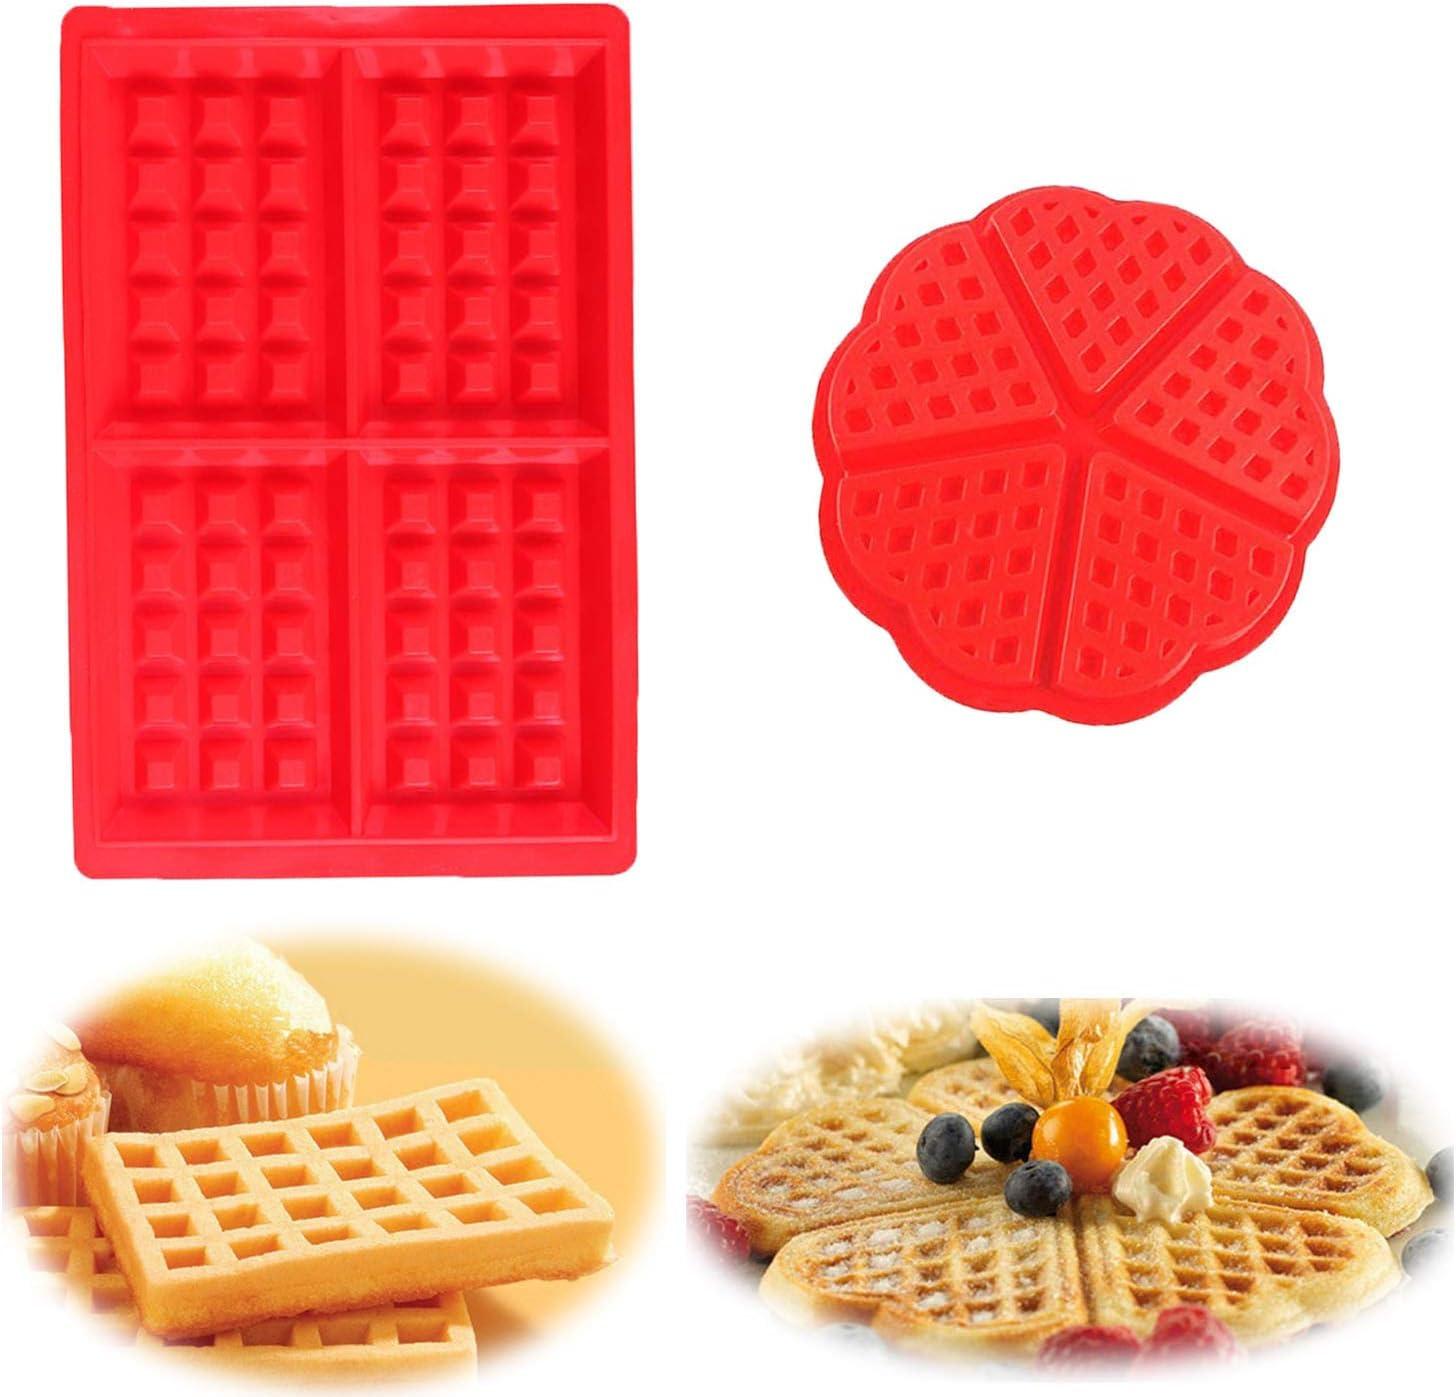 WELLXUNK Molde Gofres Silicona, Moldes Waffle, Galletas para Tarta Muffin Cocina Herramientas, para Lavavajillas, Horno, Microondas, Refrigerador